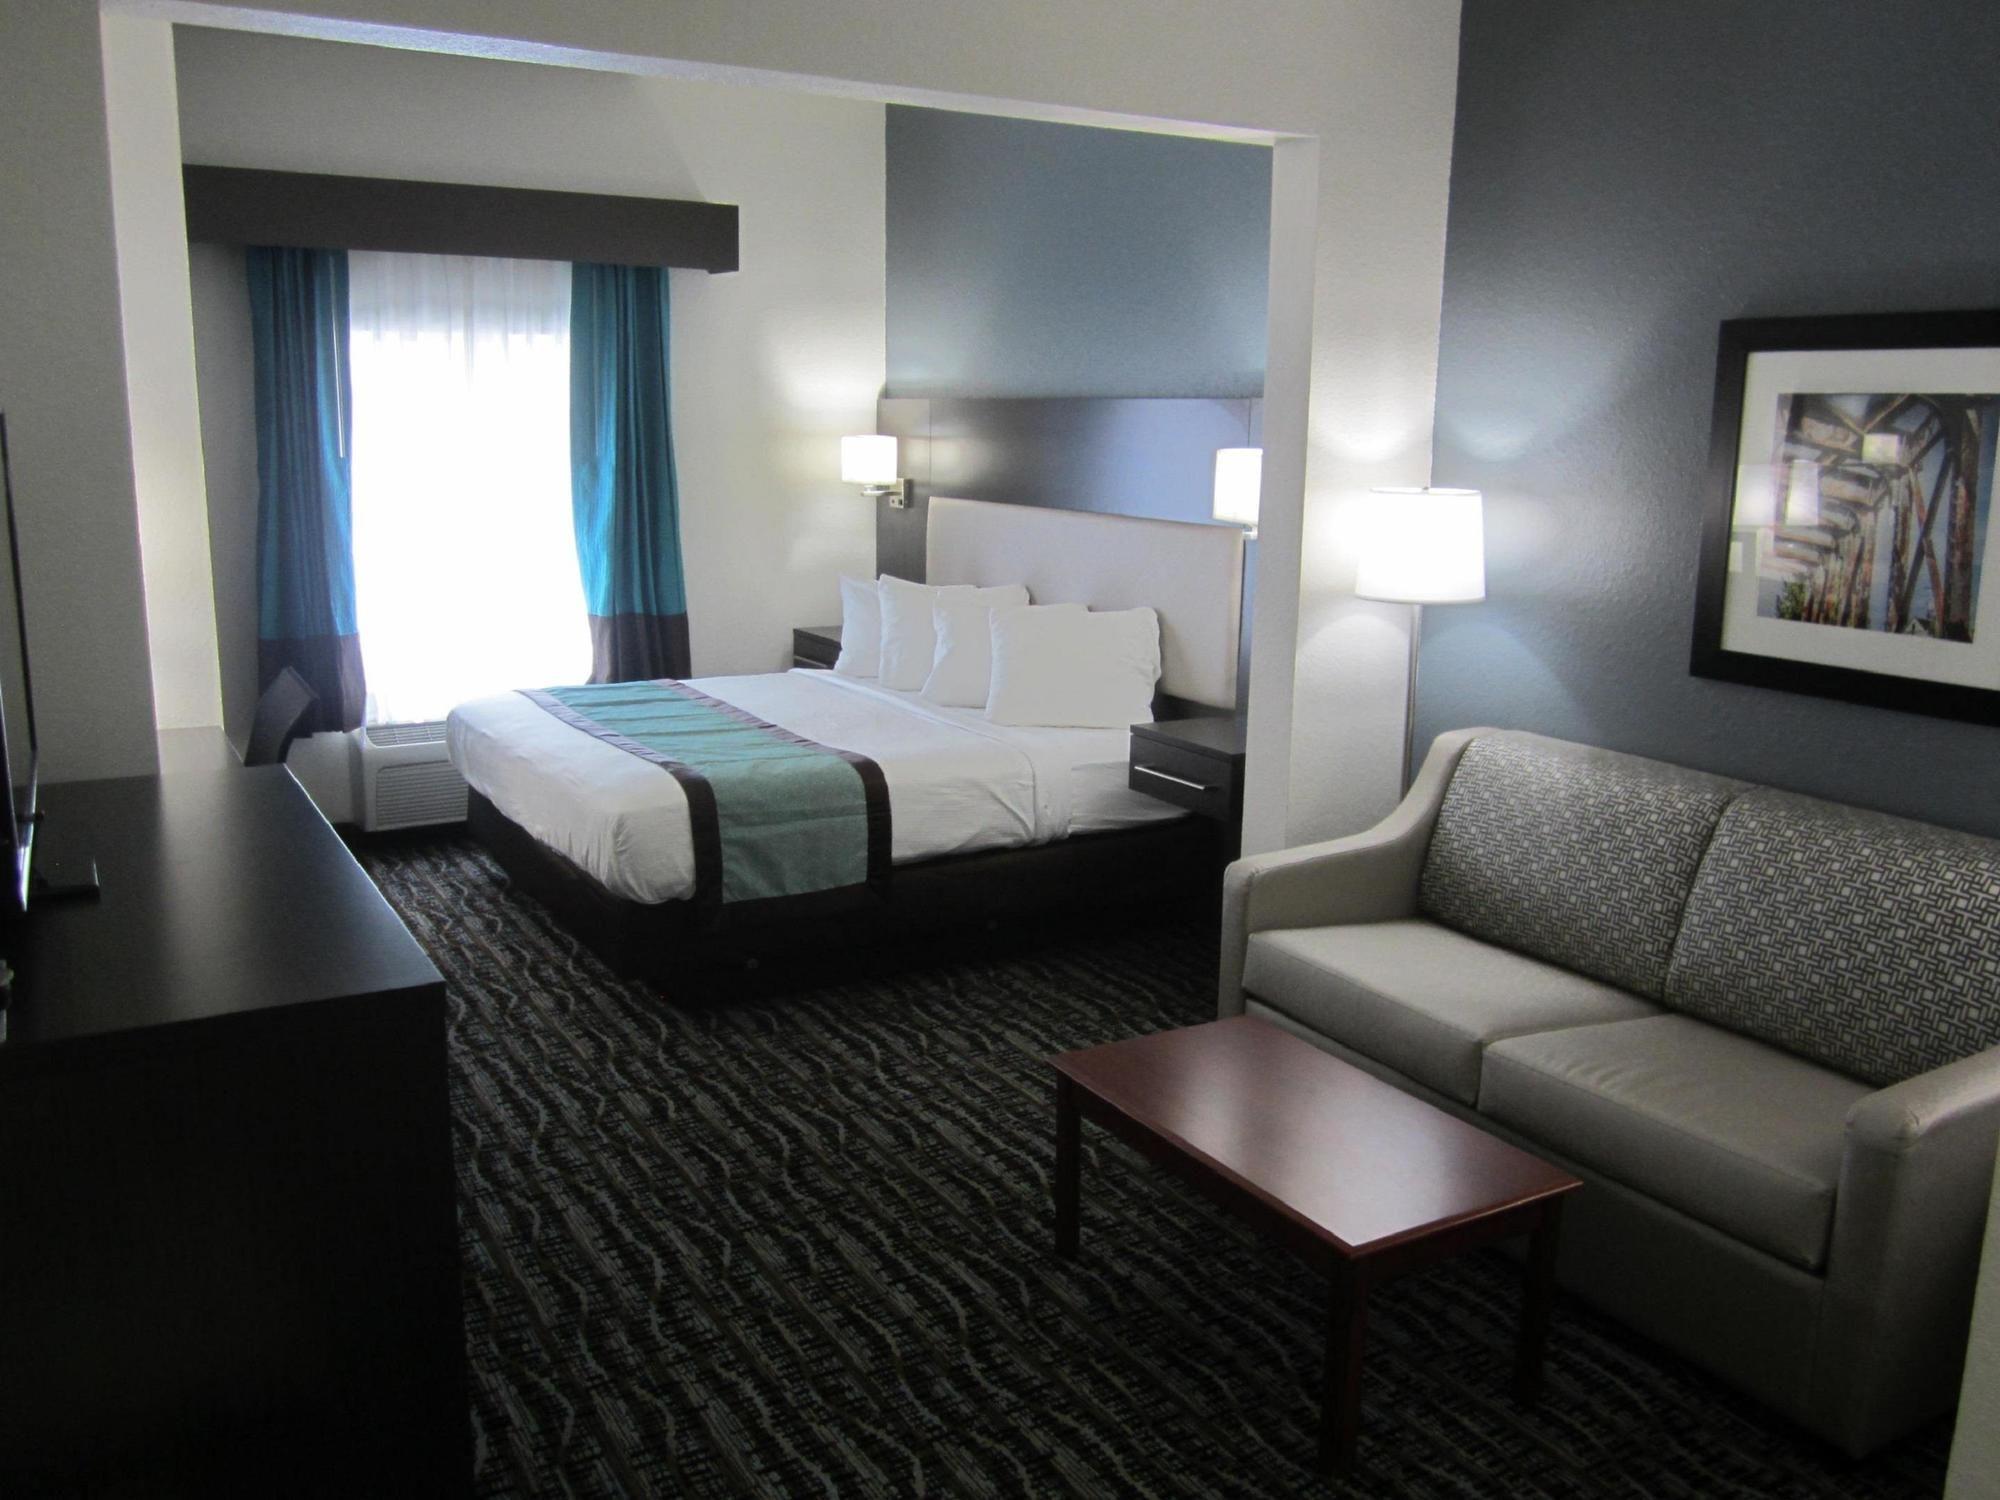 Waldo Inn and Suites in Starke, FL